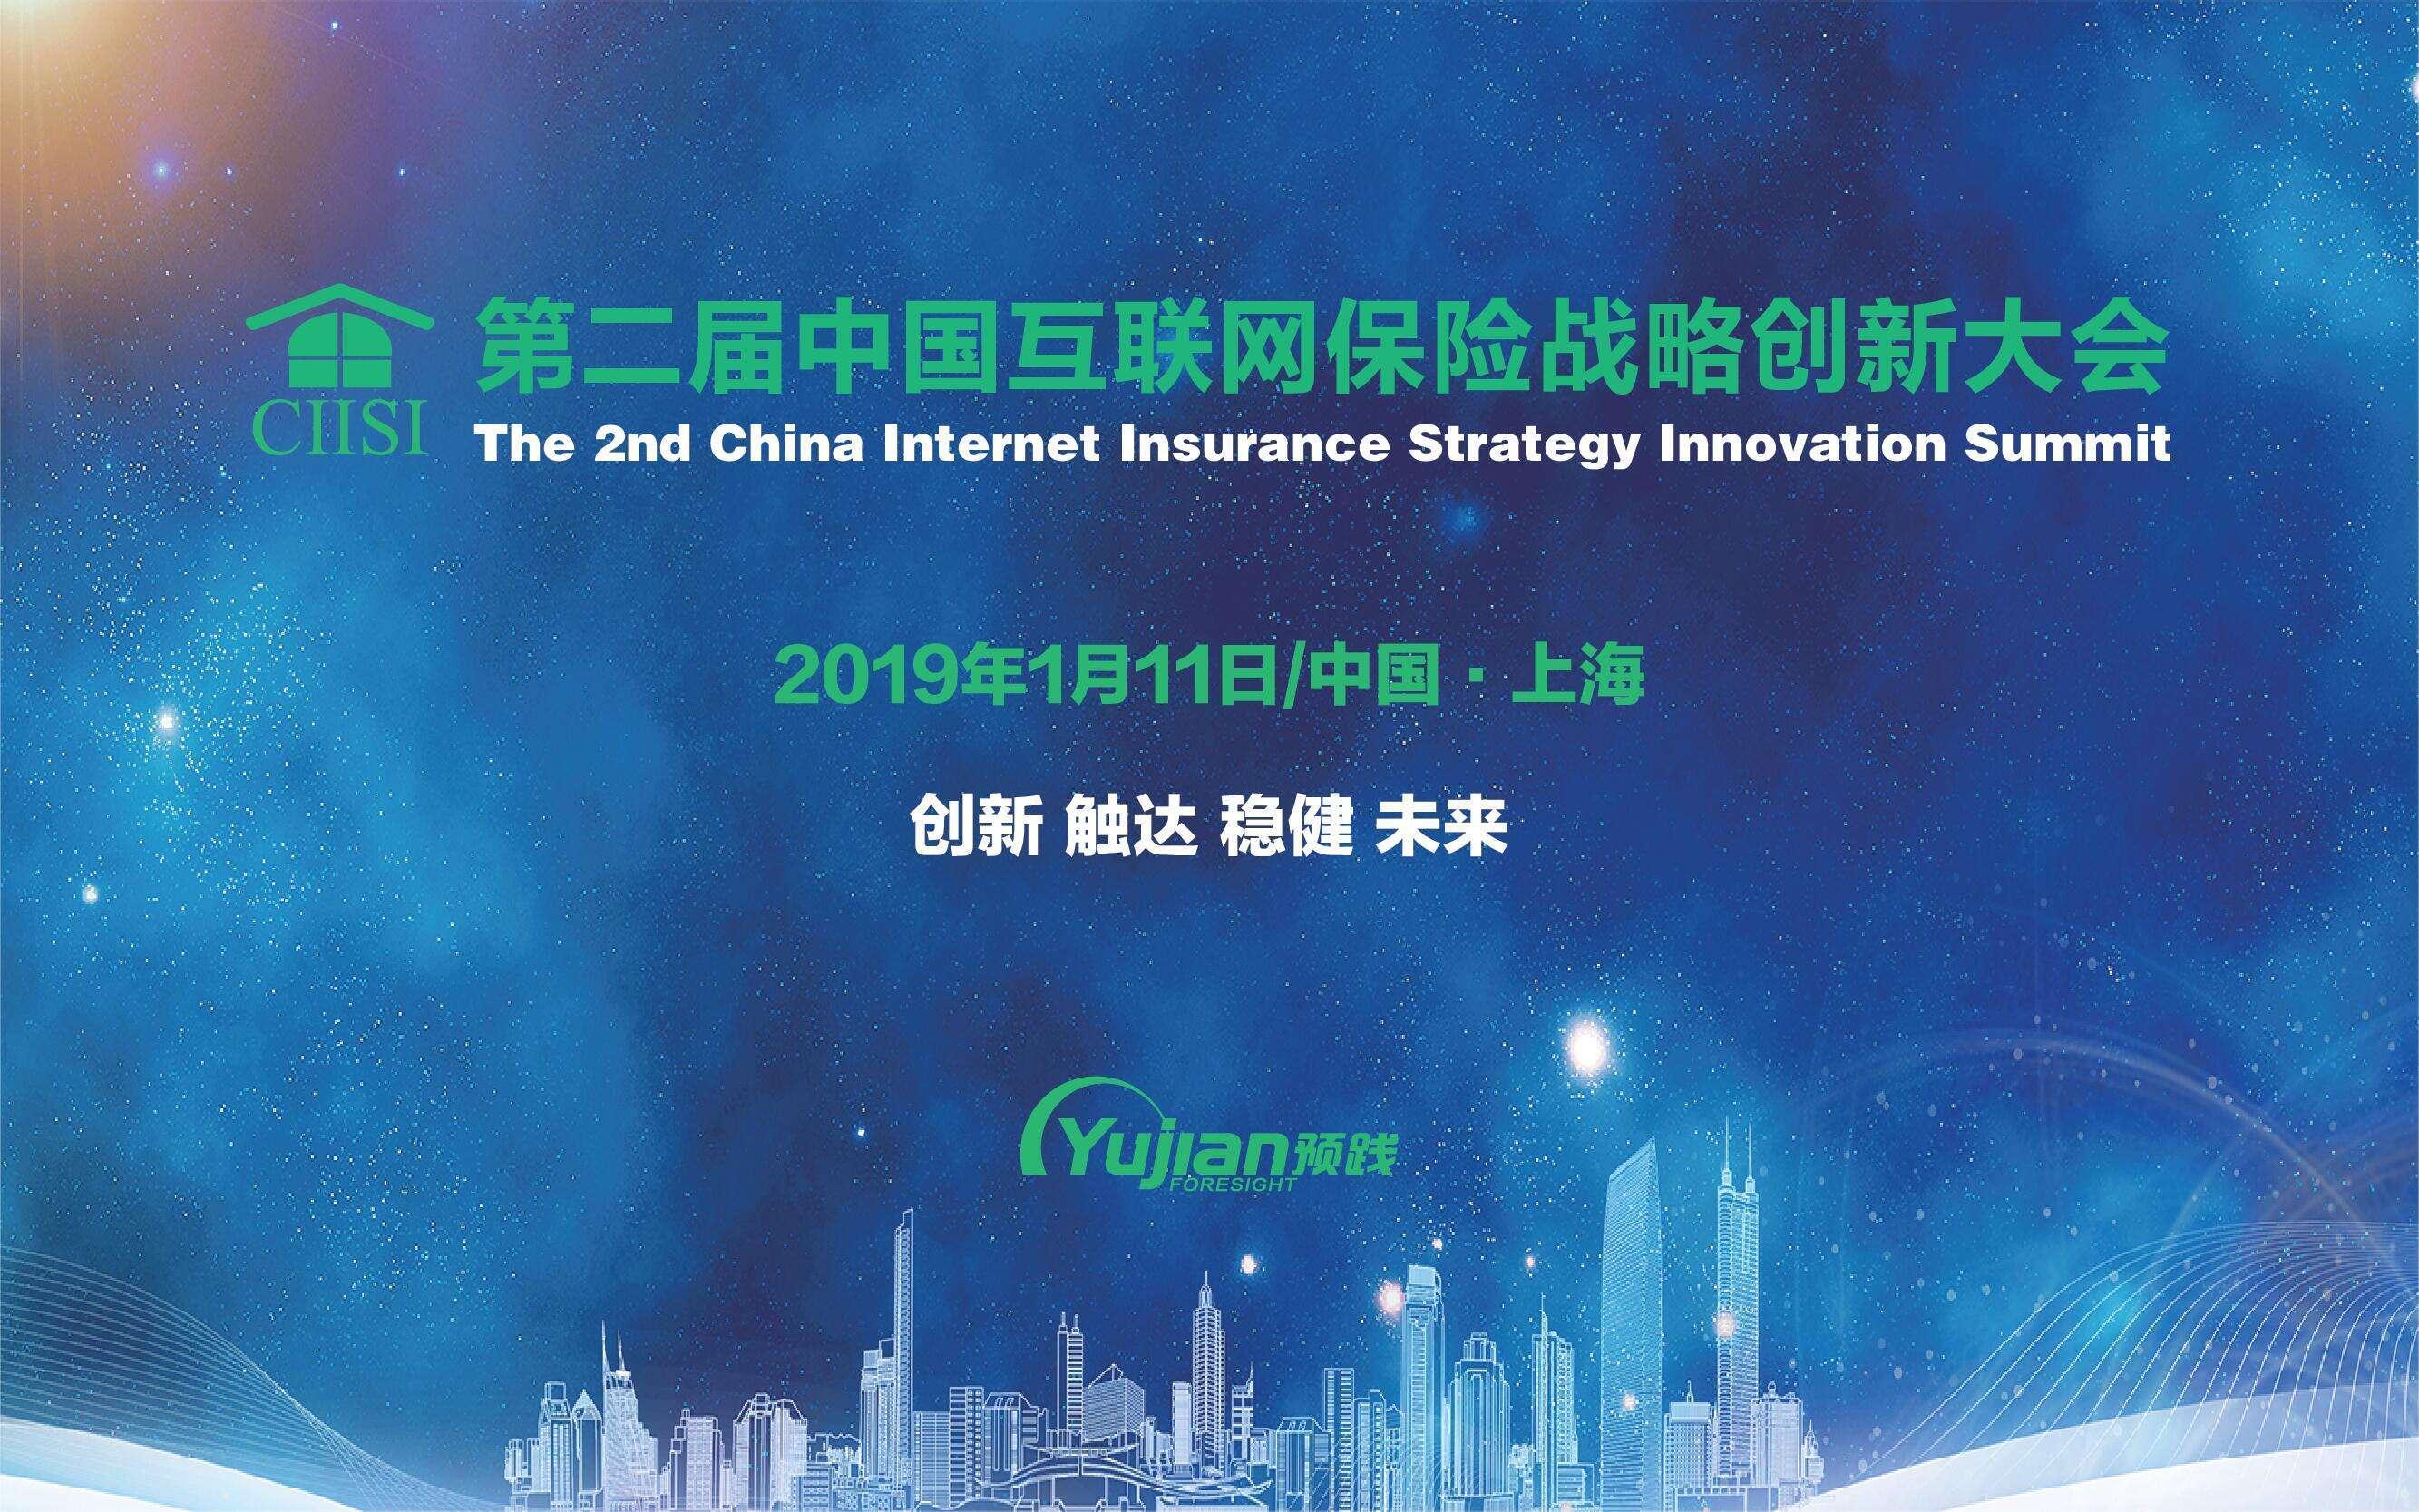 CIISI 2019中国互联网保险战略创新大会